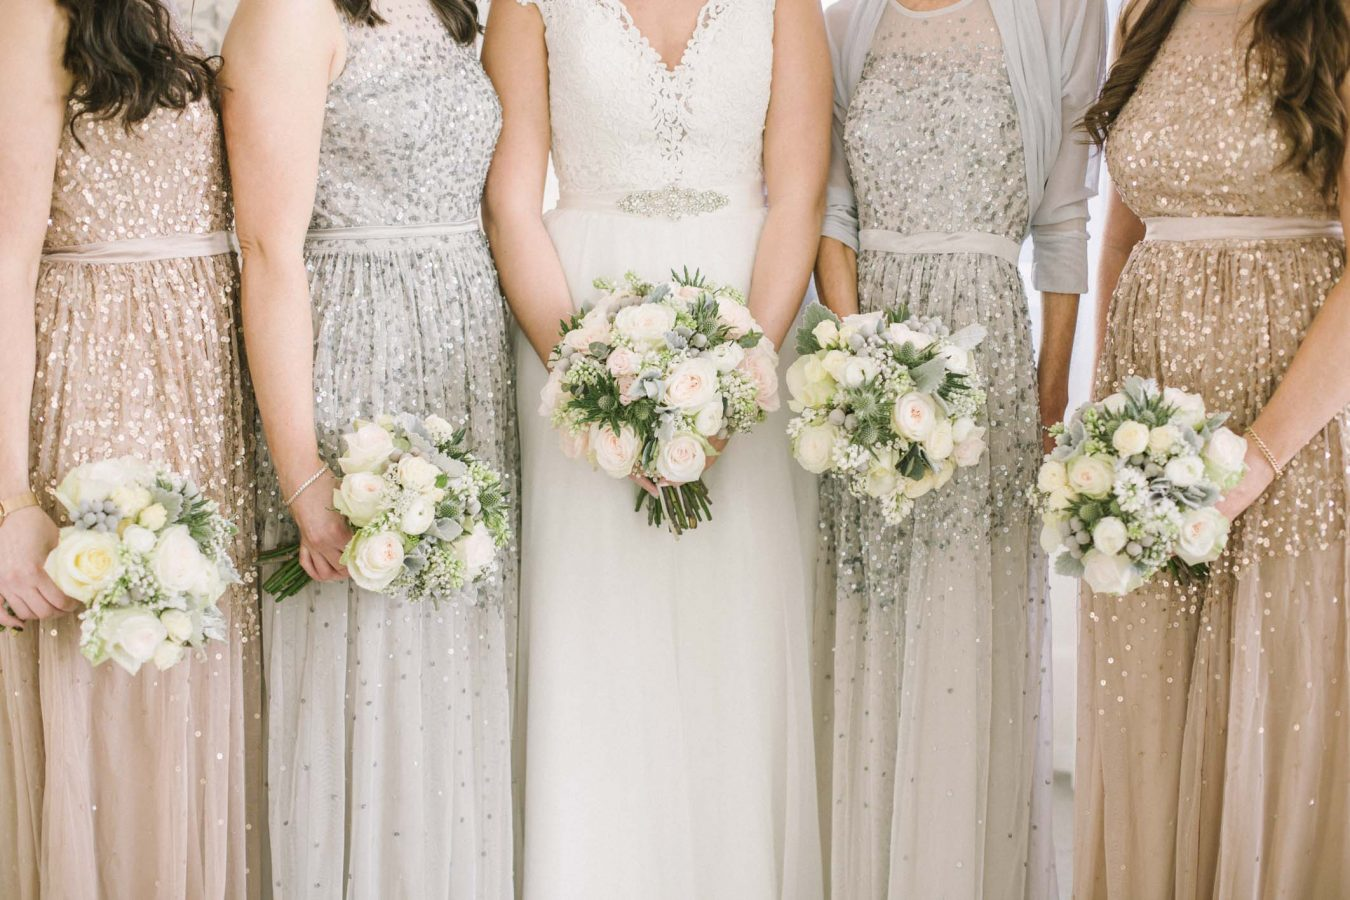 Balbirnie House Wedding captured by Edinburgh Wedding Photographer Ceranna Photography